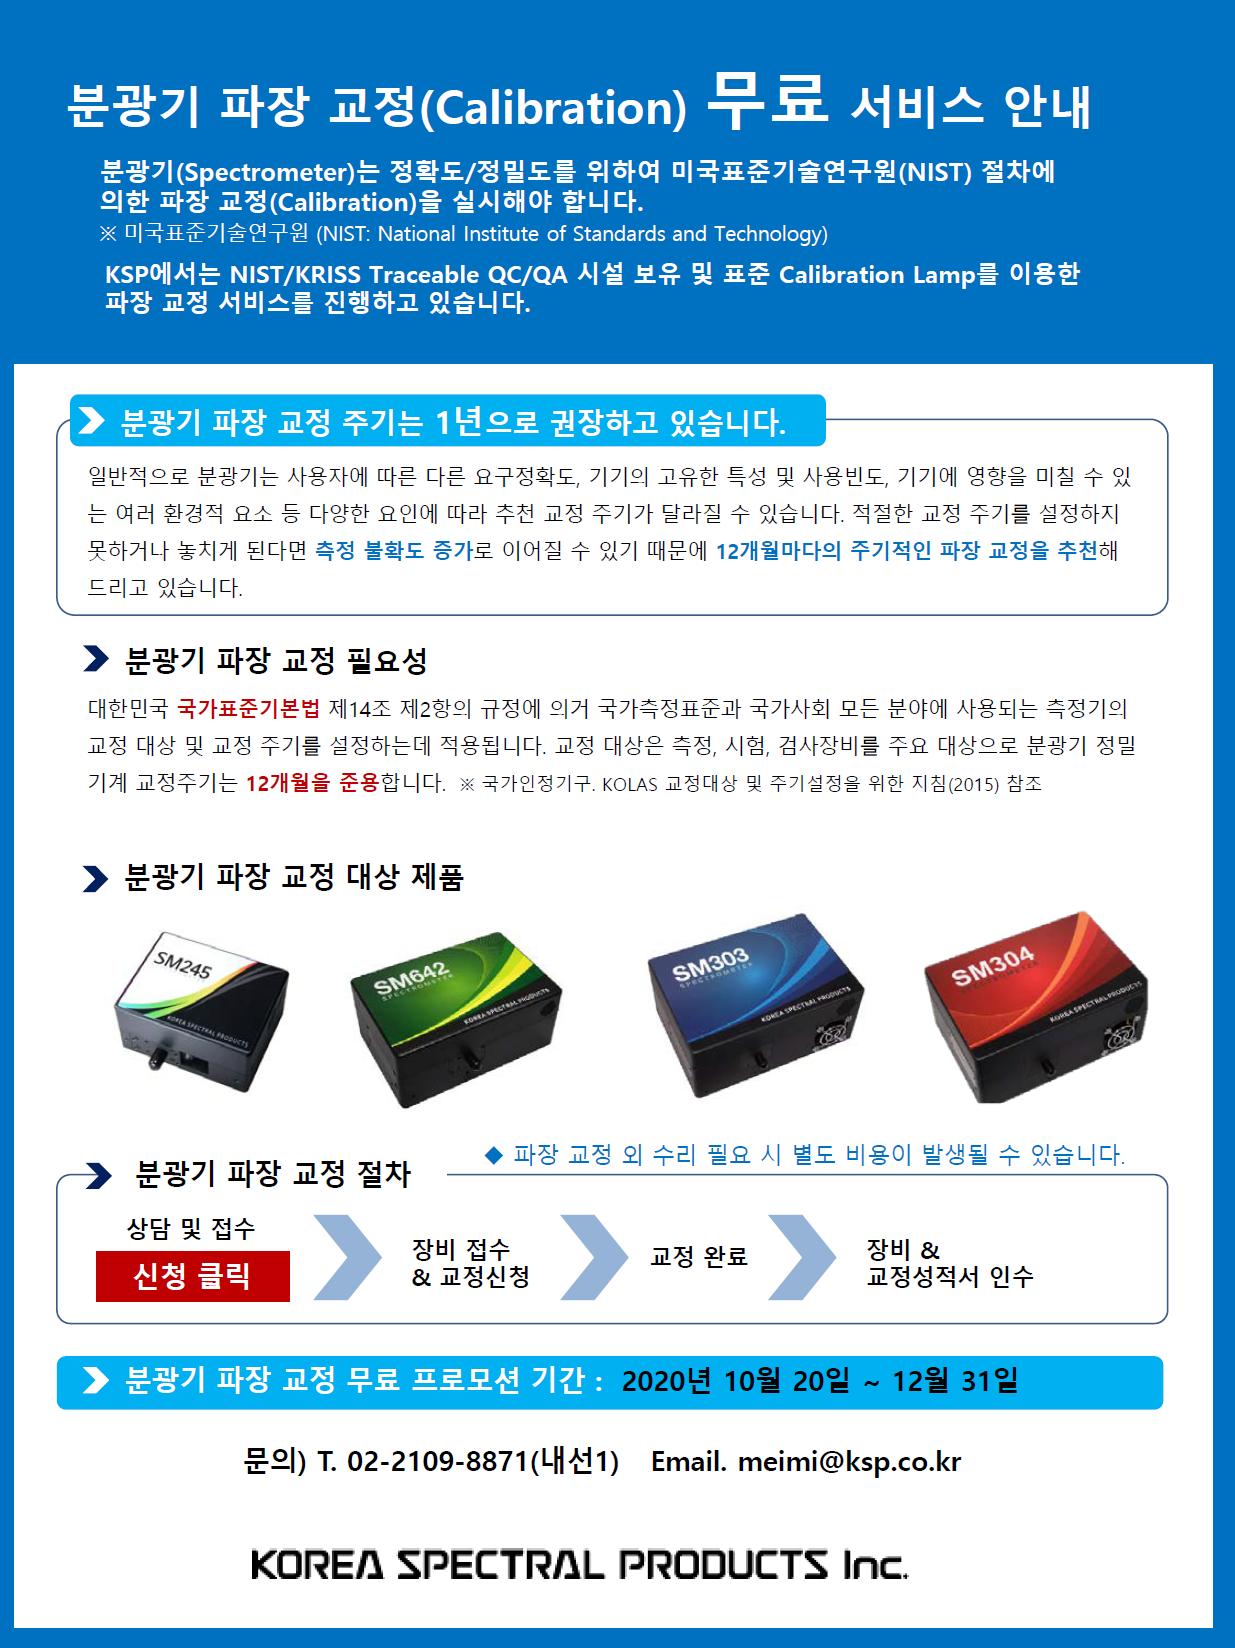 2020FW PROMOTION _분광기 파장 교정 서비스.png